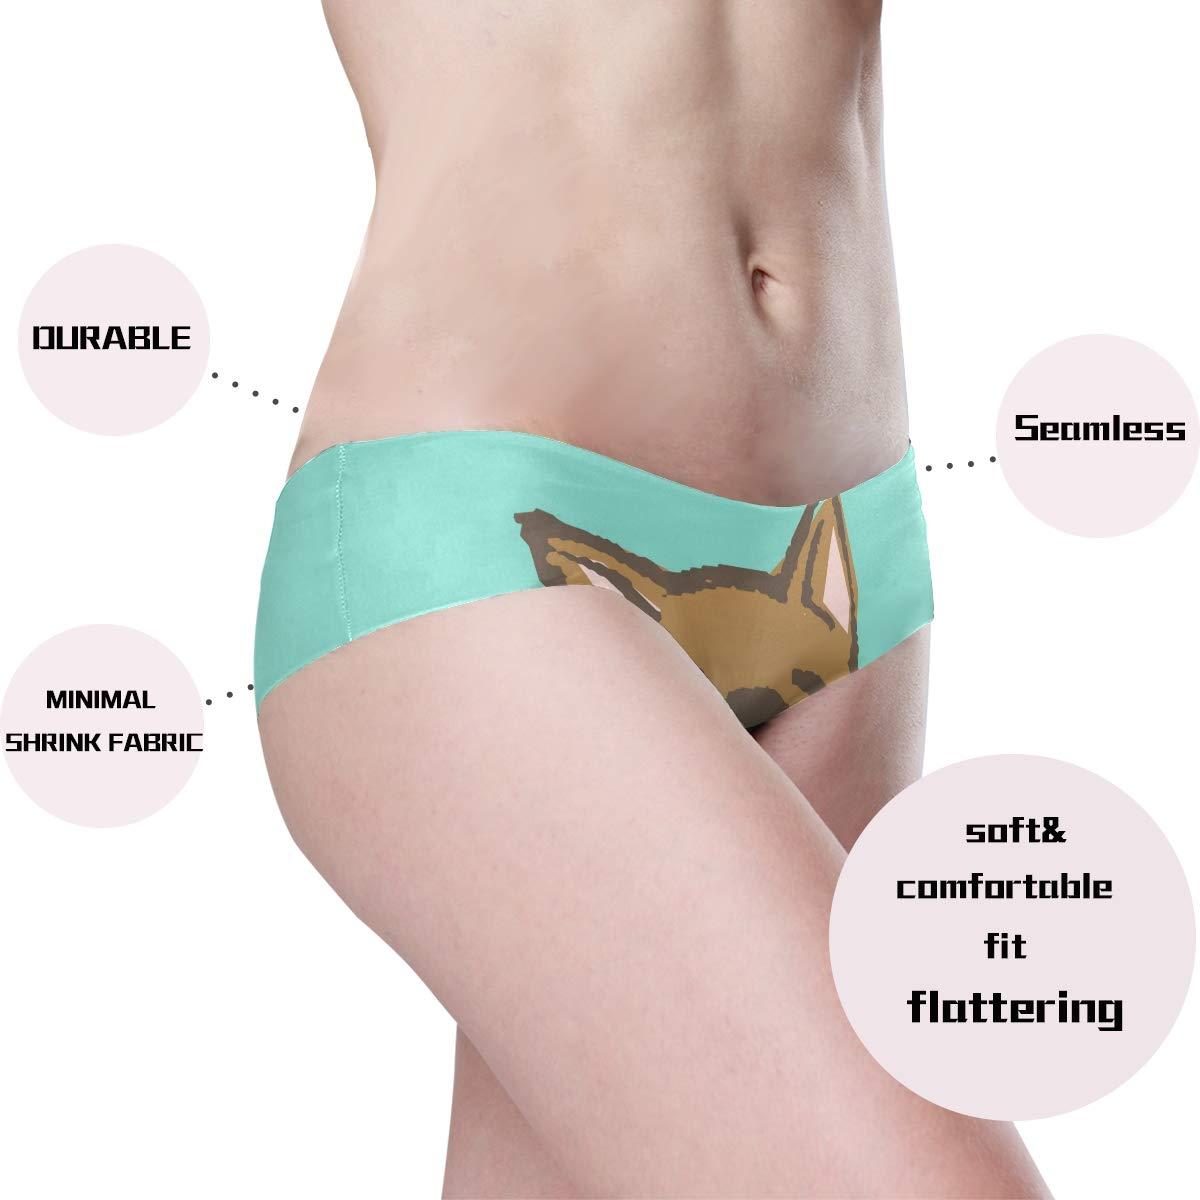 DEZIRO Shiba Inu Womens Panties Seamless Panties Soft Stretch Bikini Underwear